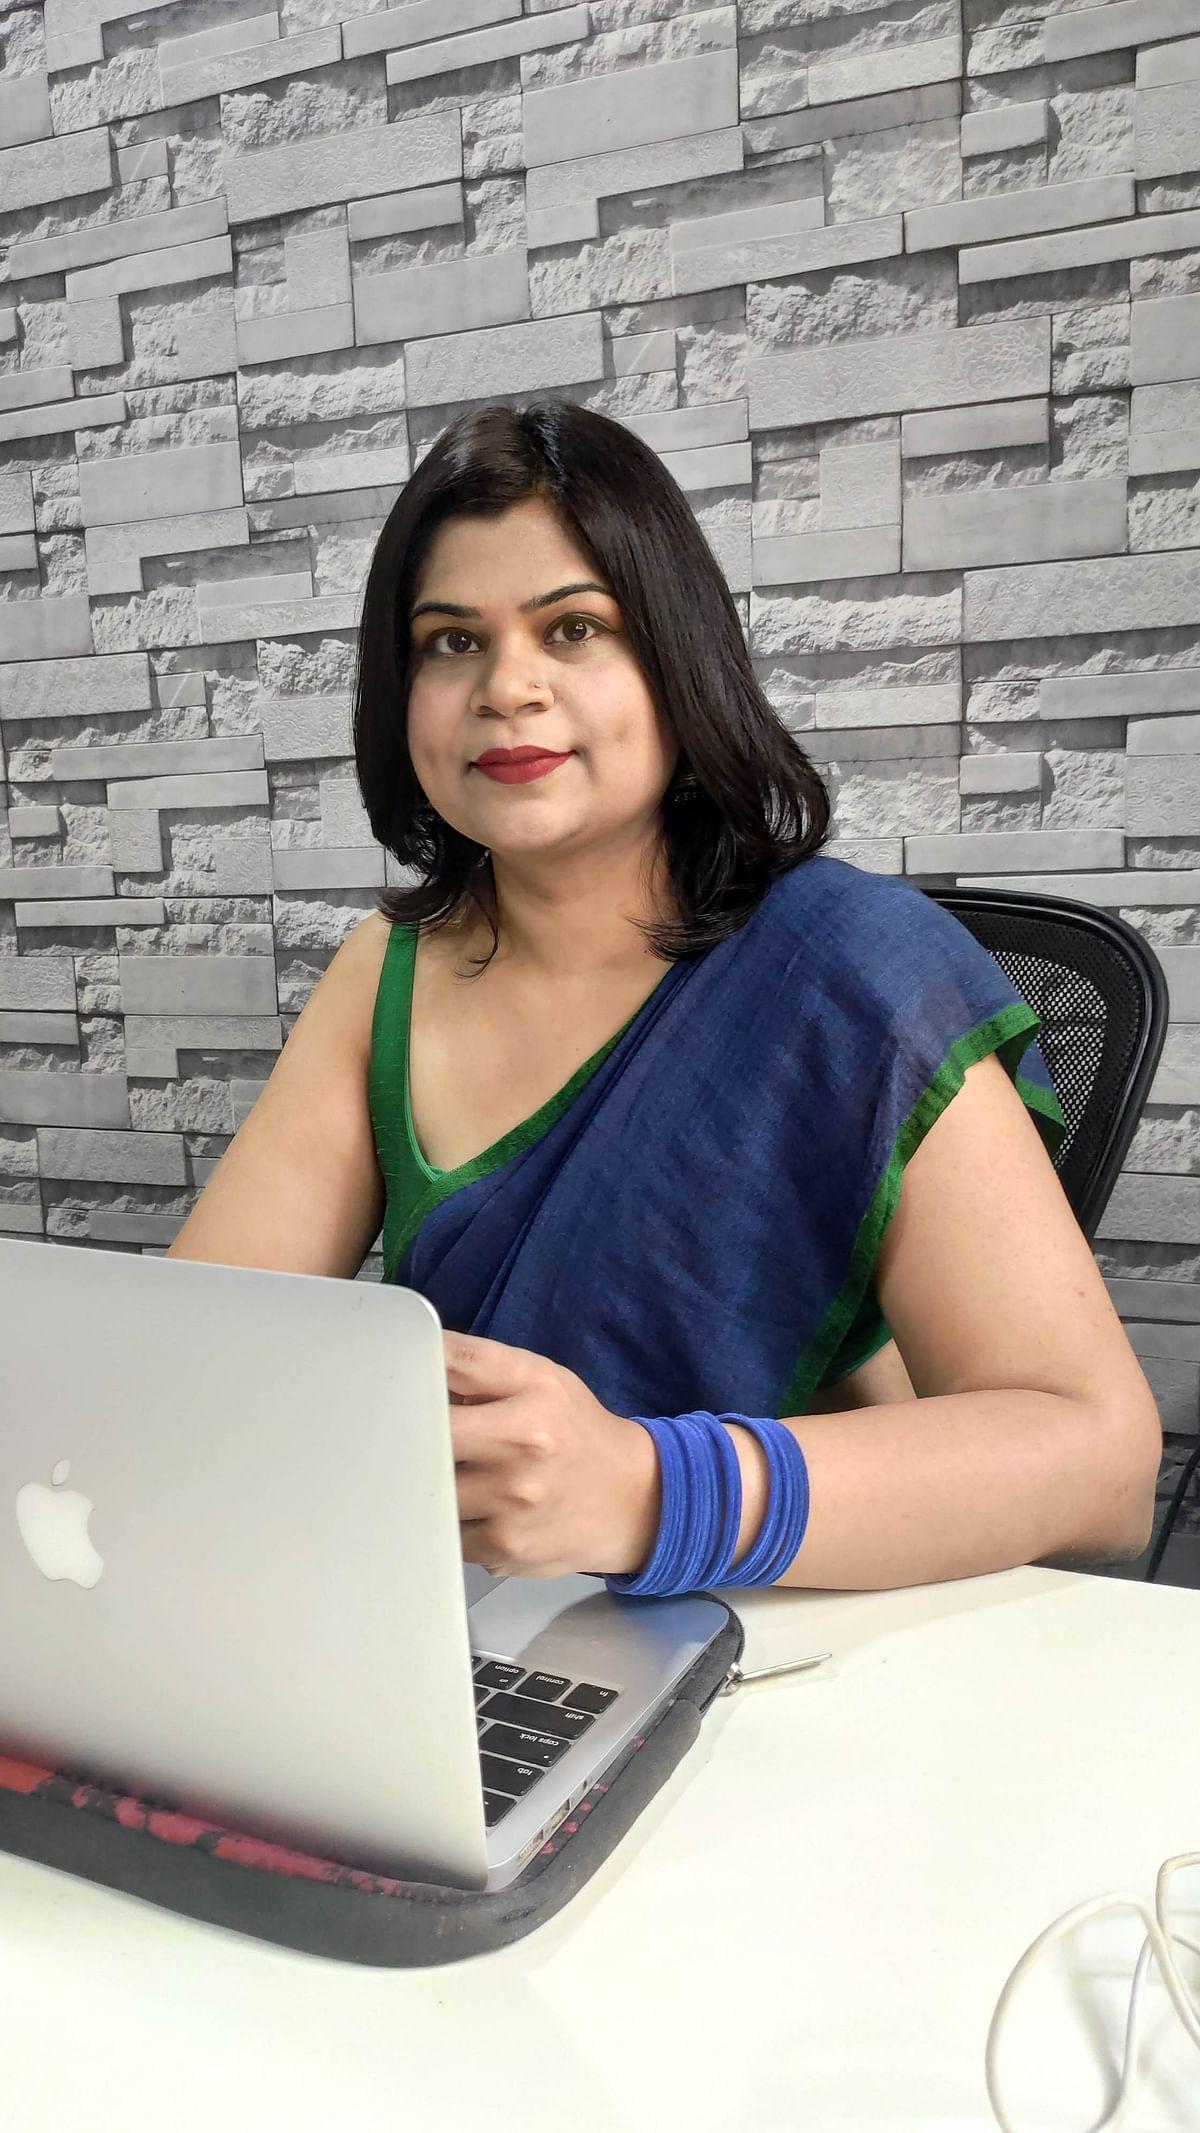 Nisha Nair, marketing maverick, brand consultant, and co-promoter of The Veg Boxxx